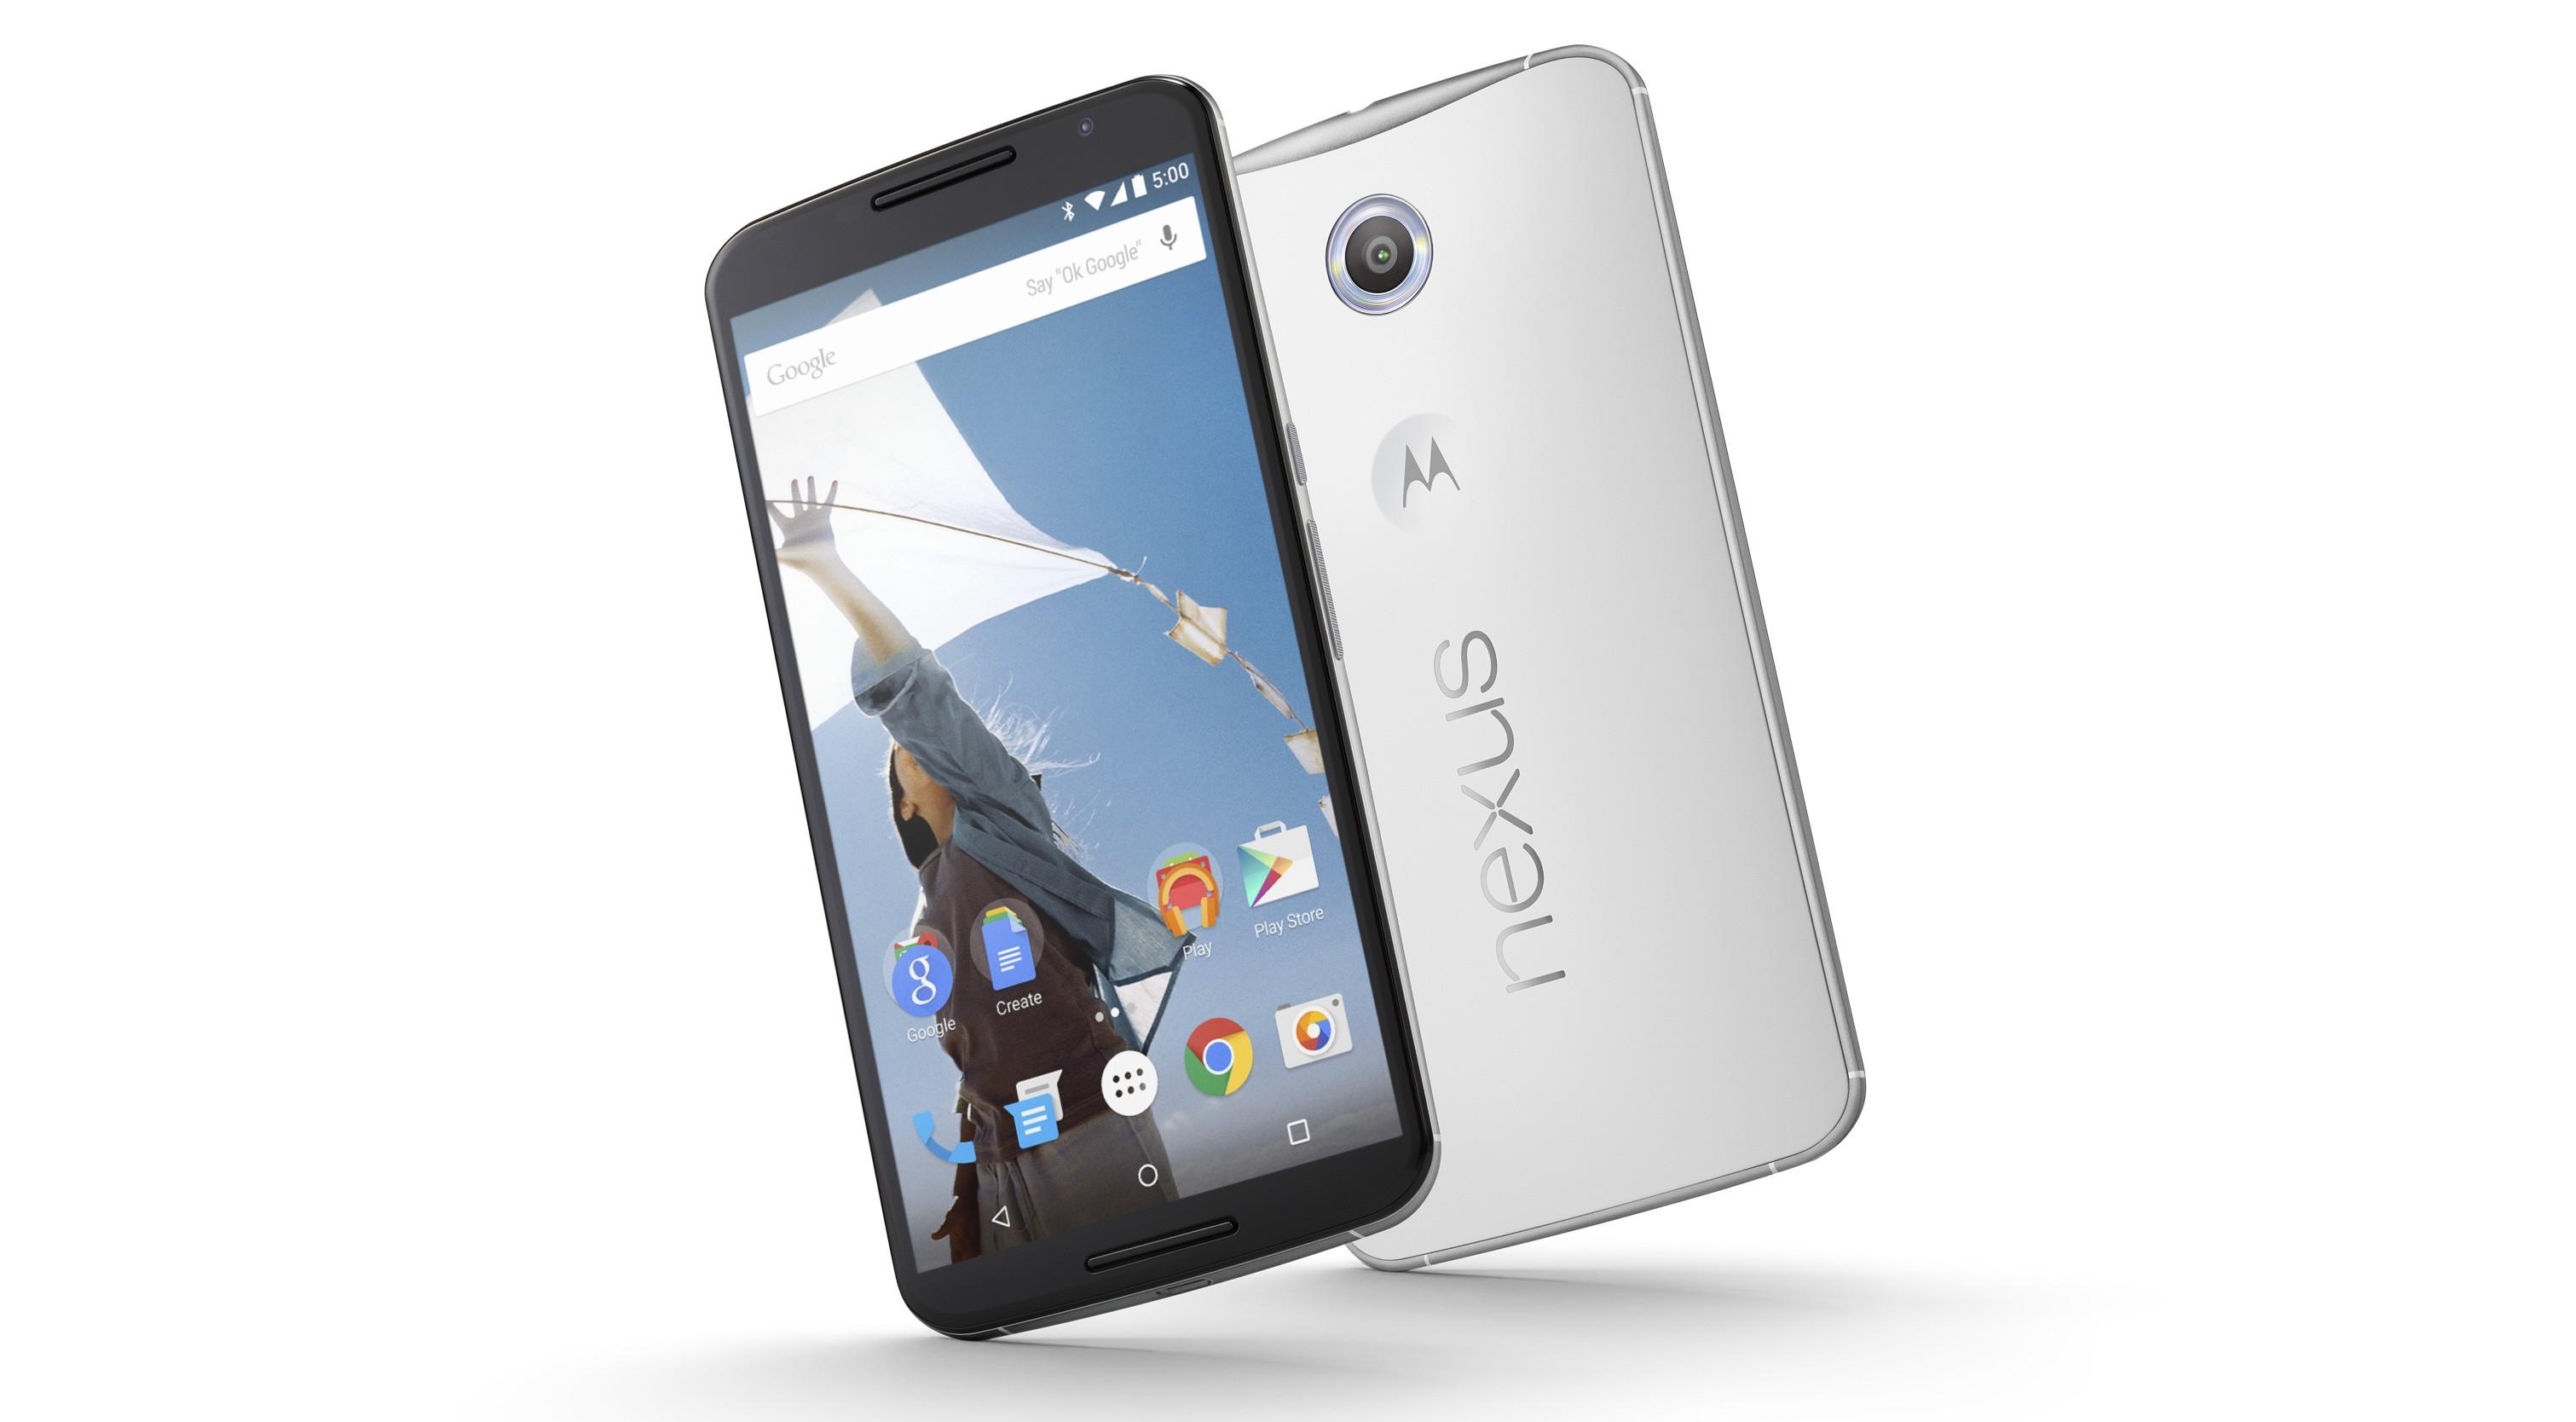 Nexus 6 riceverà a breve l'upgrade ad Android Lollipop 5.1.1